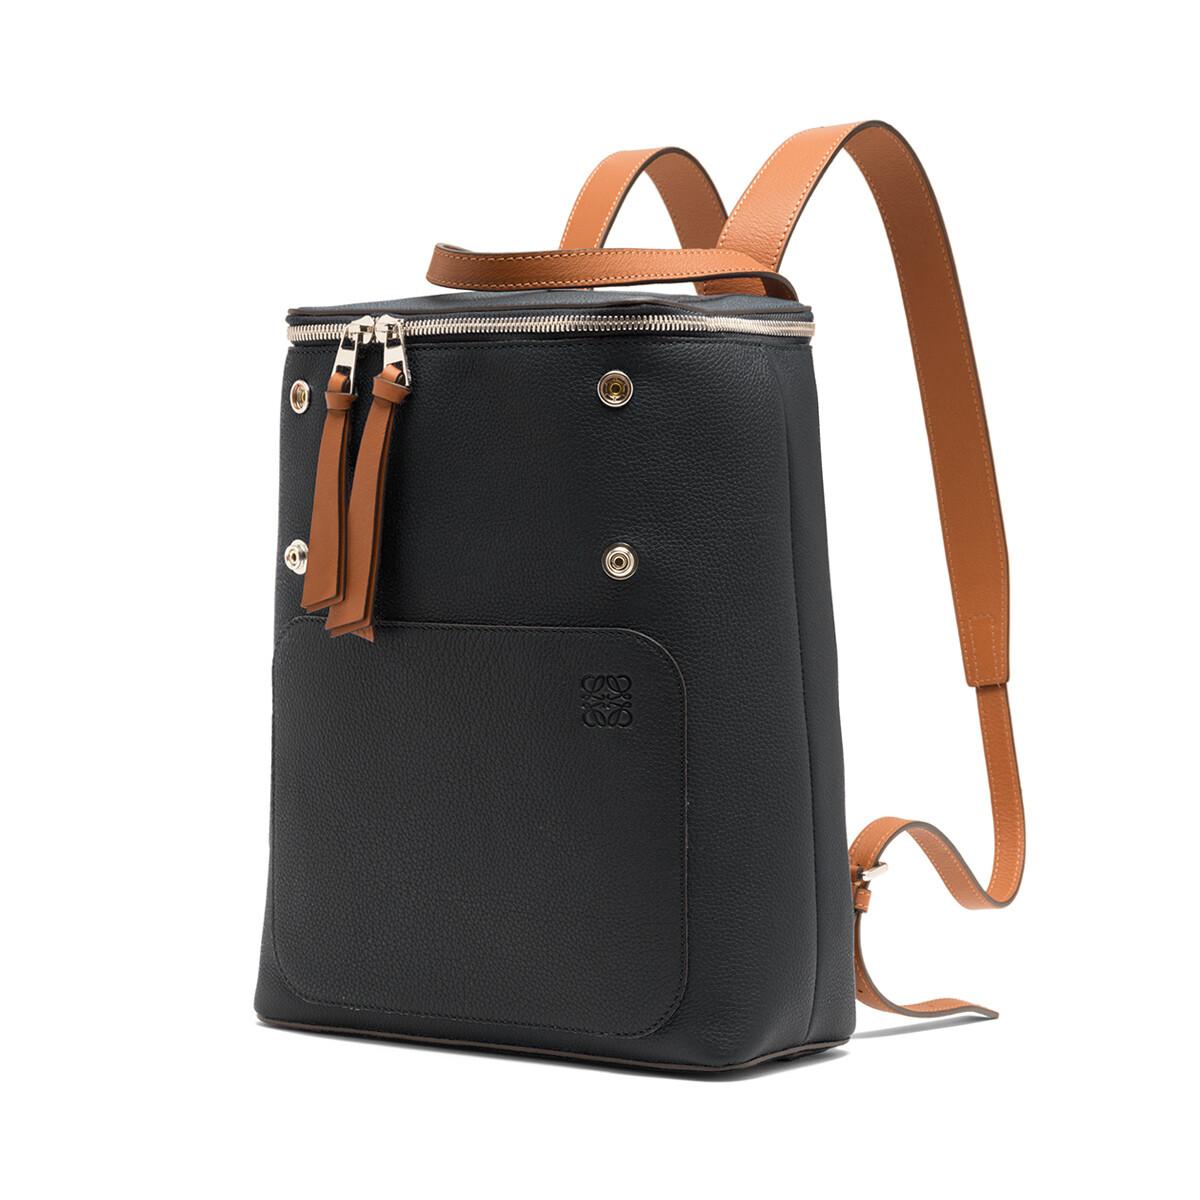 LOEWE Goya Small Backpack Black/Pecan Color front